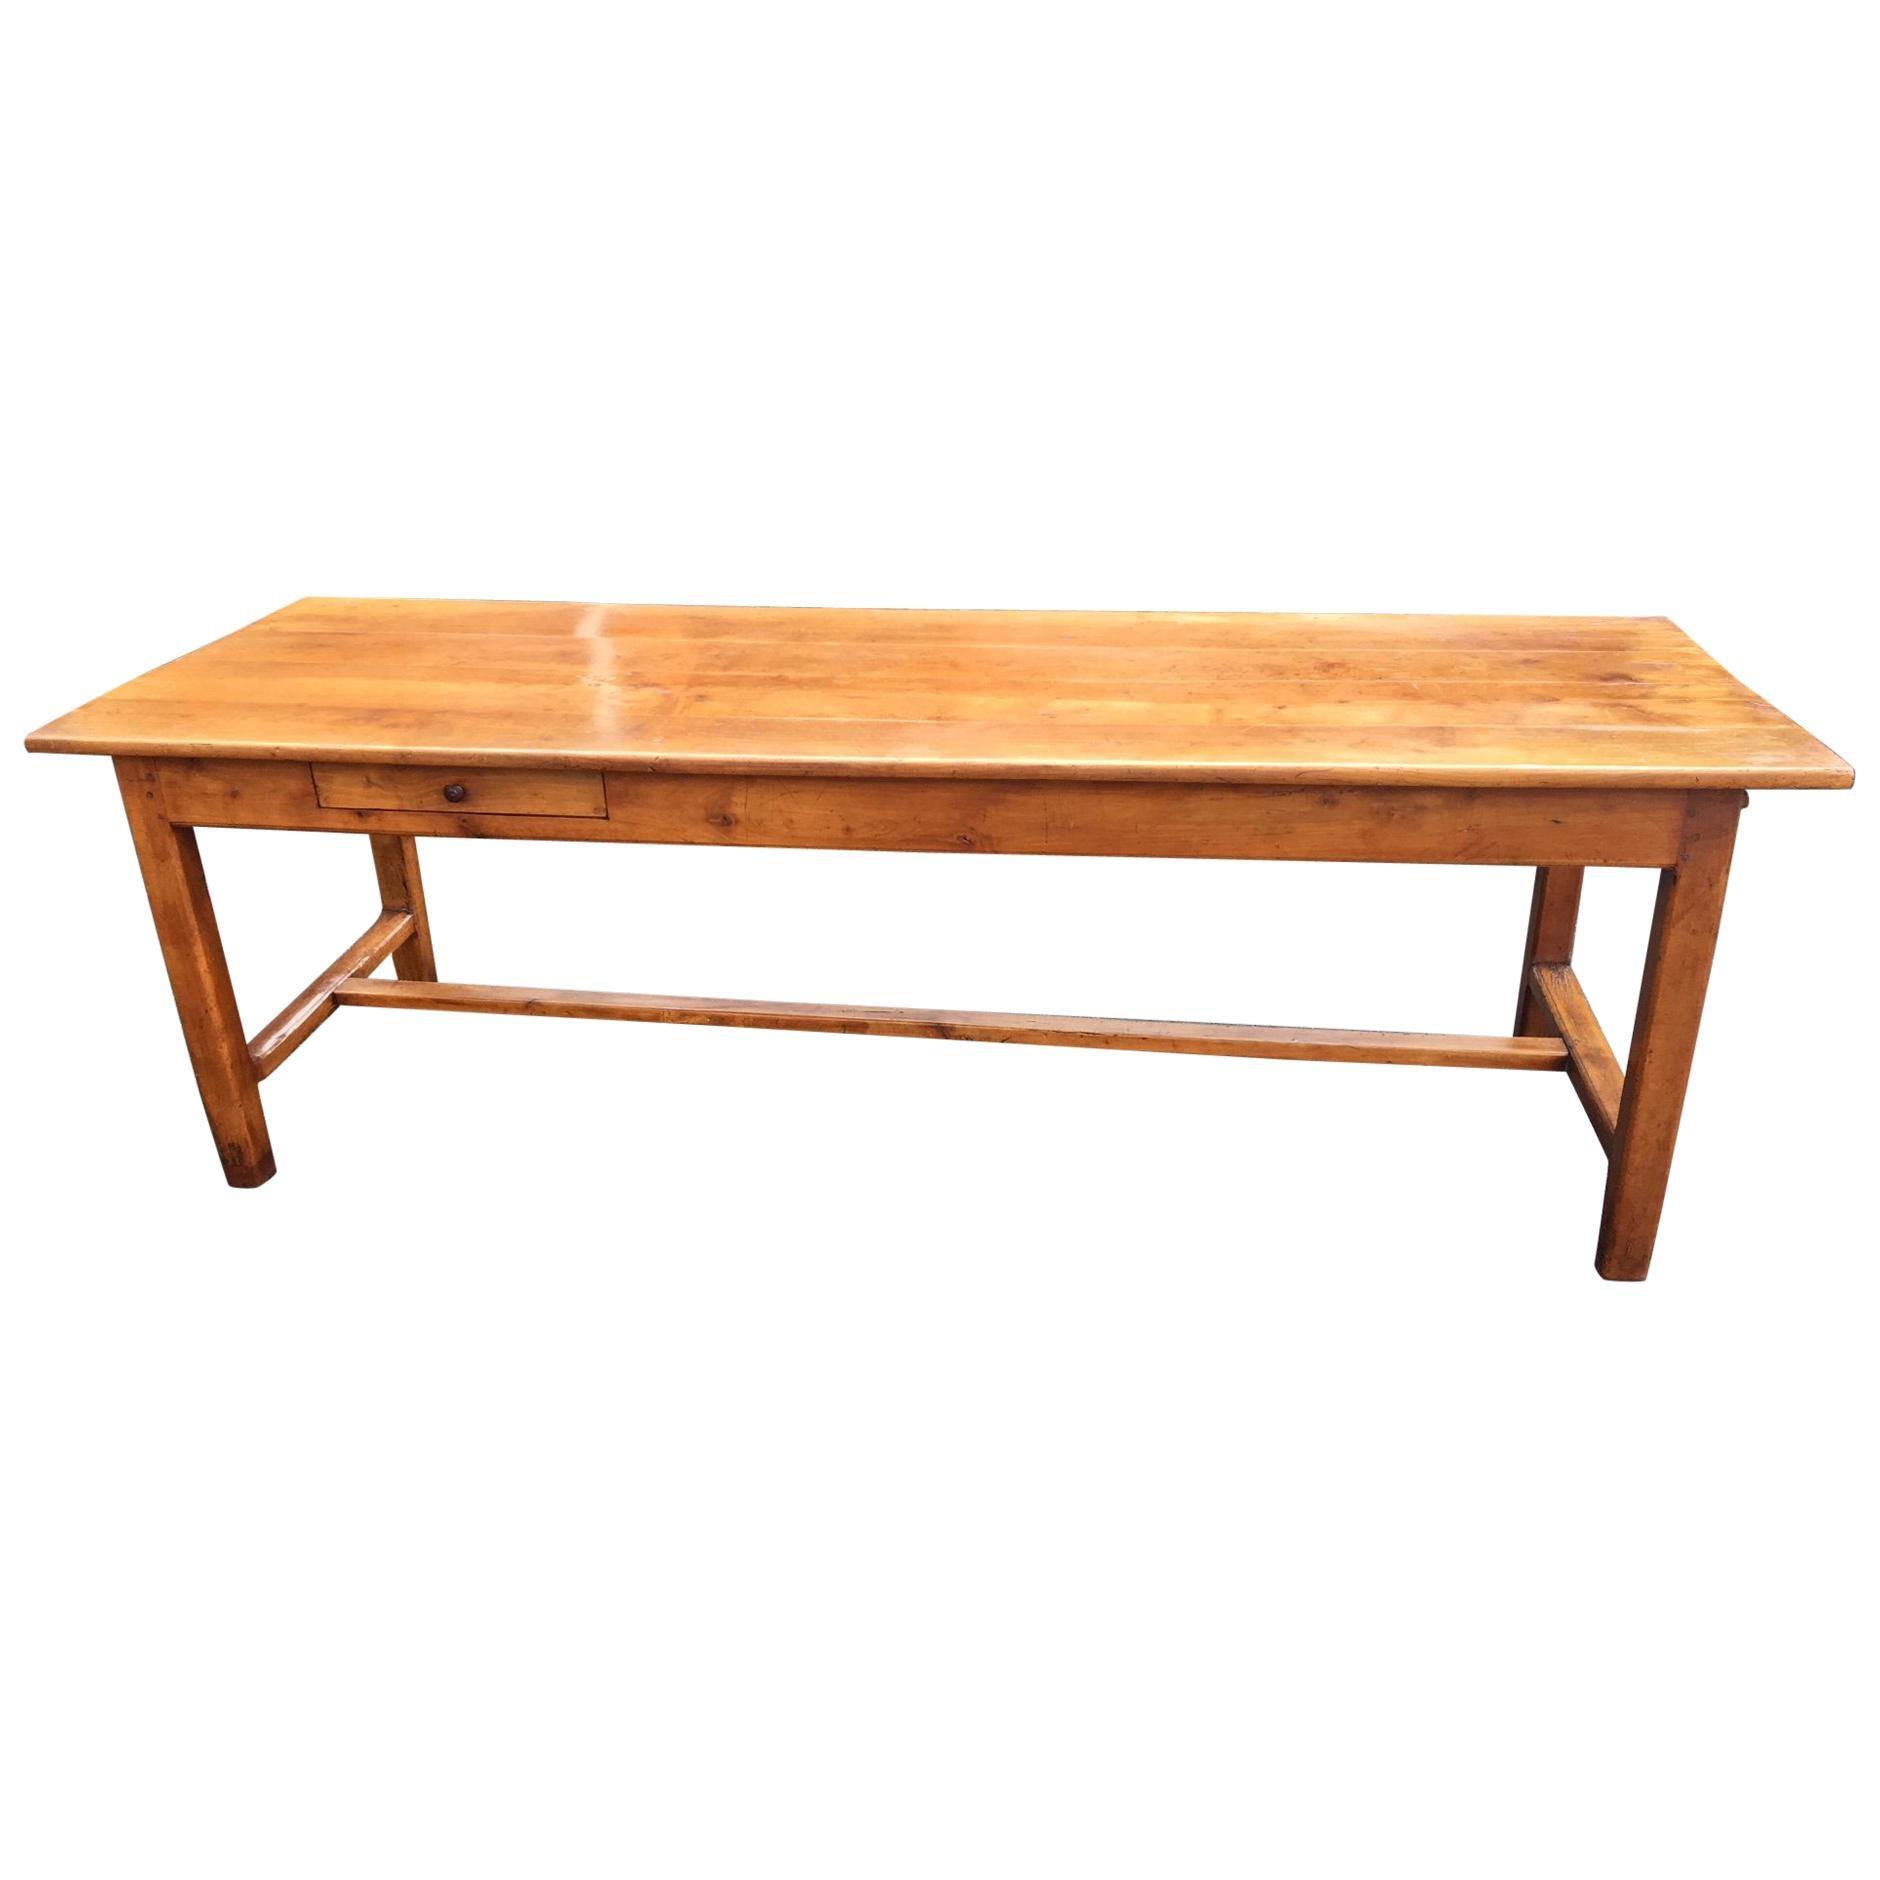 Beau Cherry Wood Farmhouse Table, French, Circa 1860